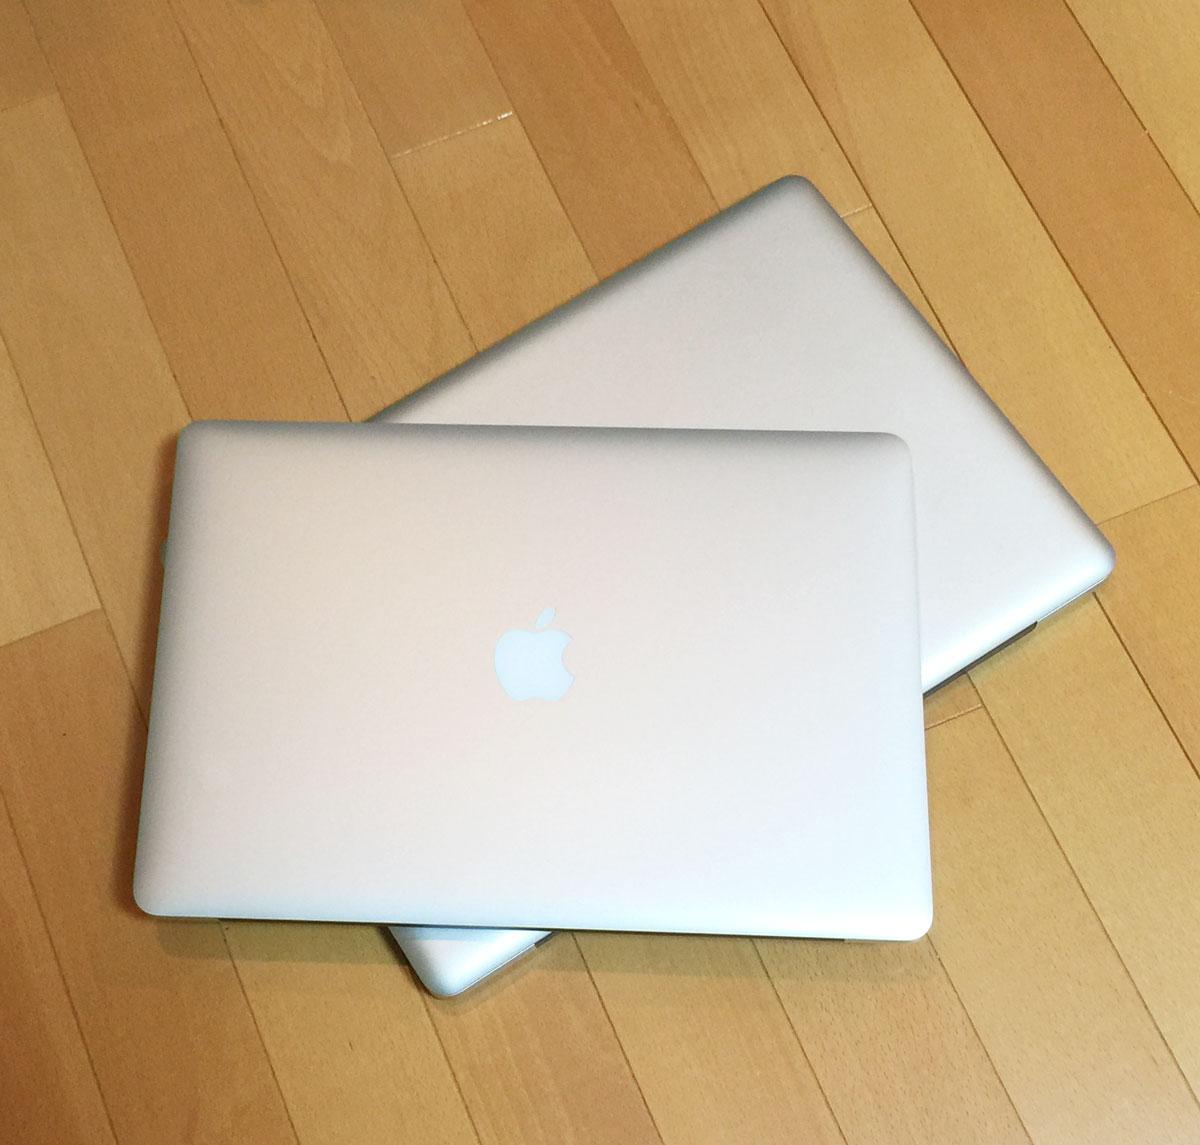 MacBook Pro Retinaディスプレイモデル15インチとMacBook Pro 17インチの比較